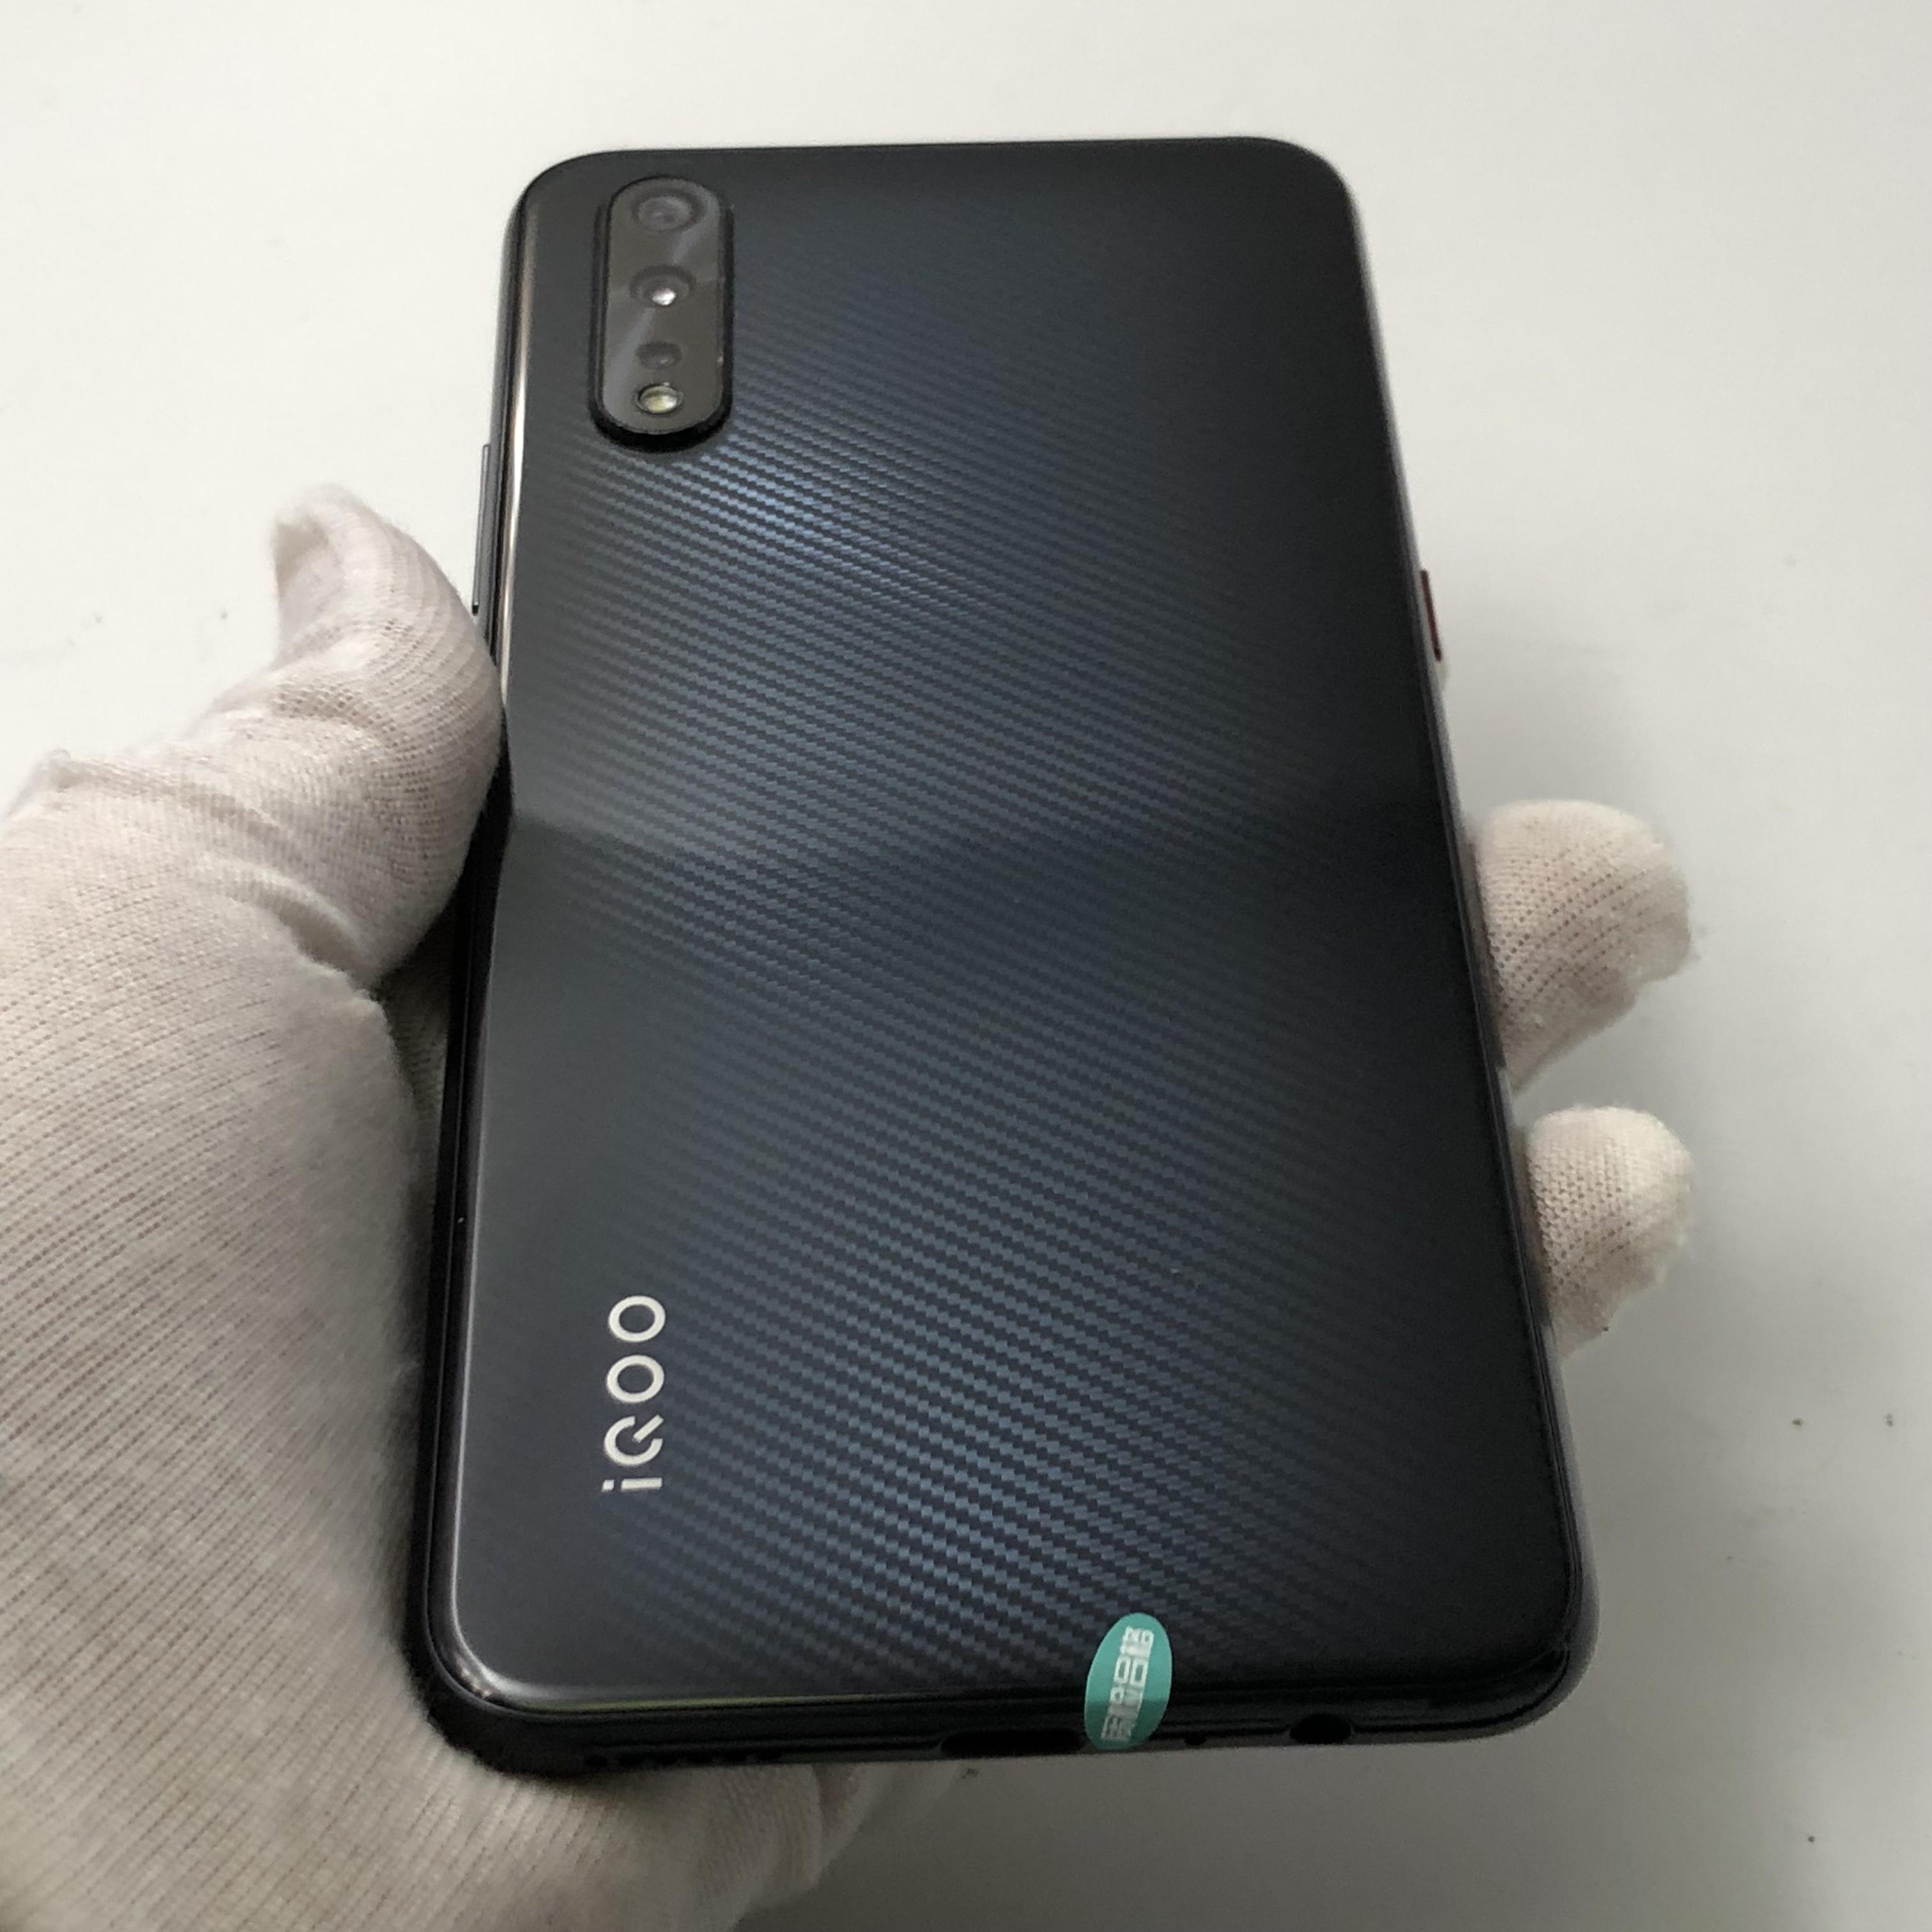 vivo【iQOO Neo】4G全网通 黑色 8G/128G 国行 95新